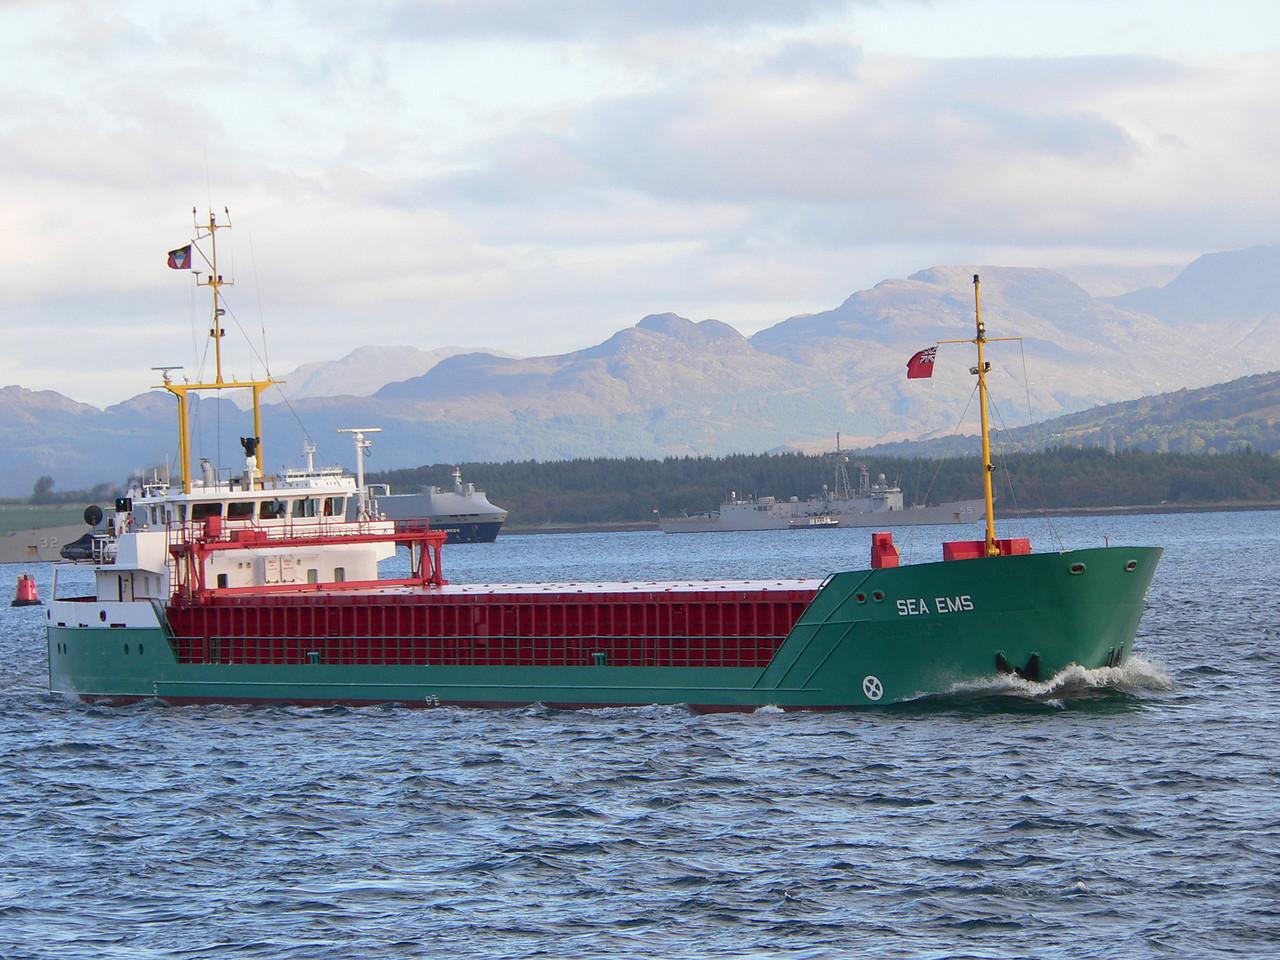 SEA EMS